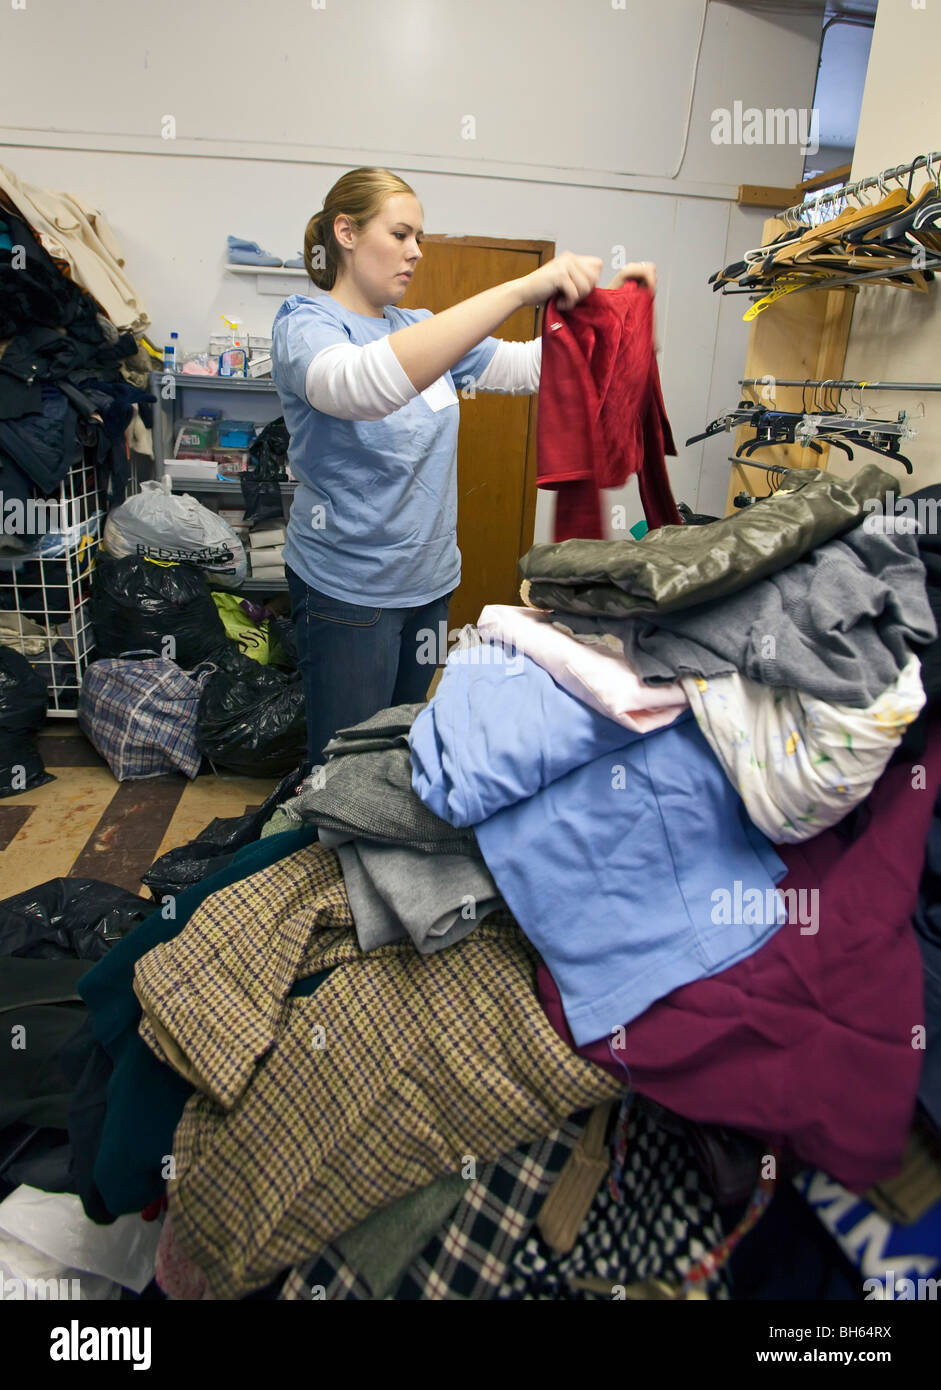 Volunteer Sorts Donated Clothing at Thrift Shop - Stock Image